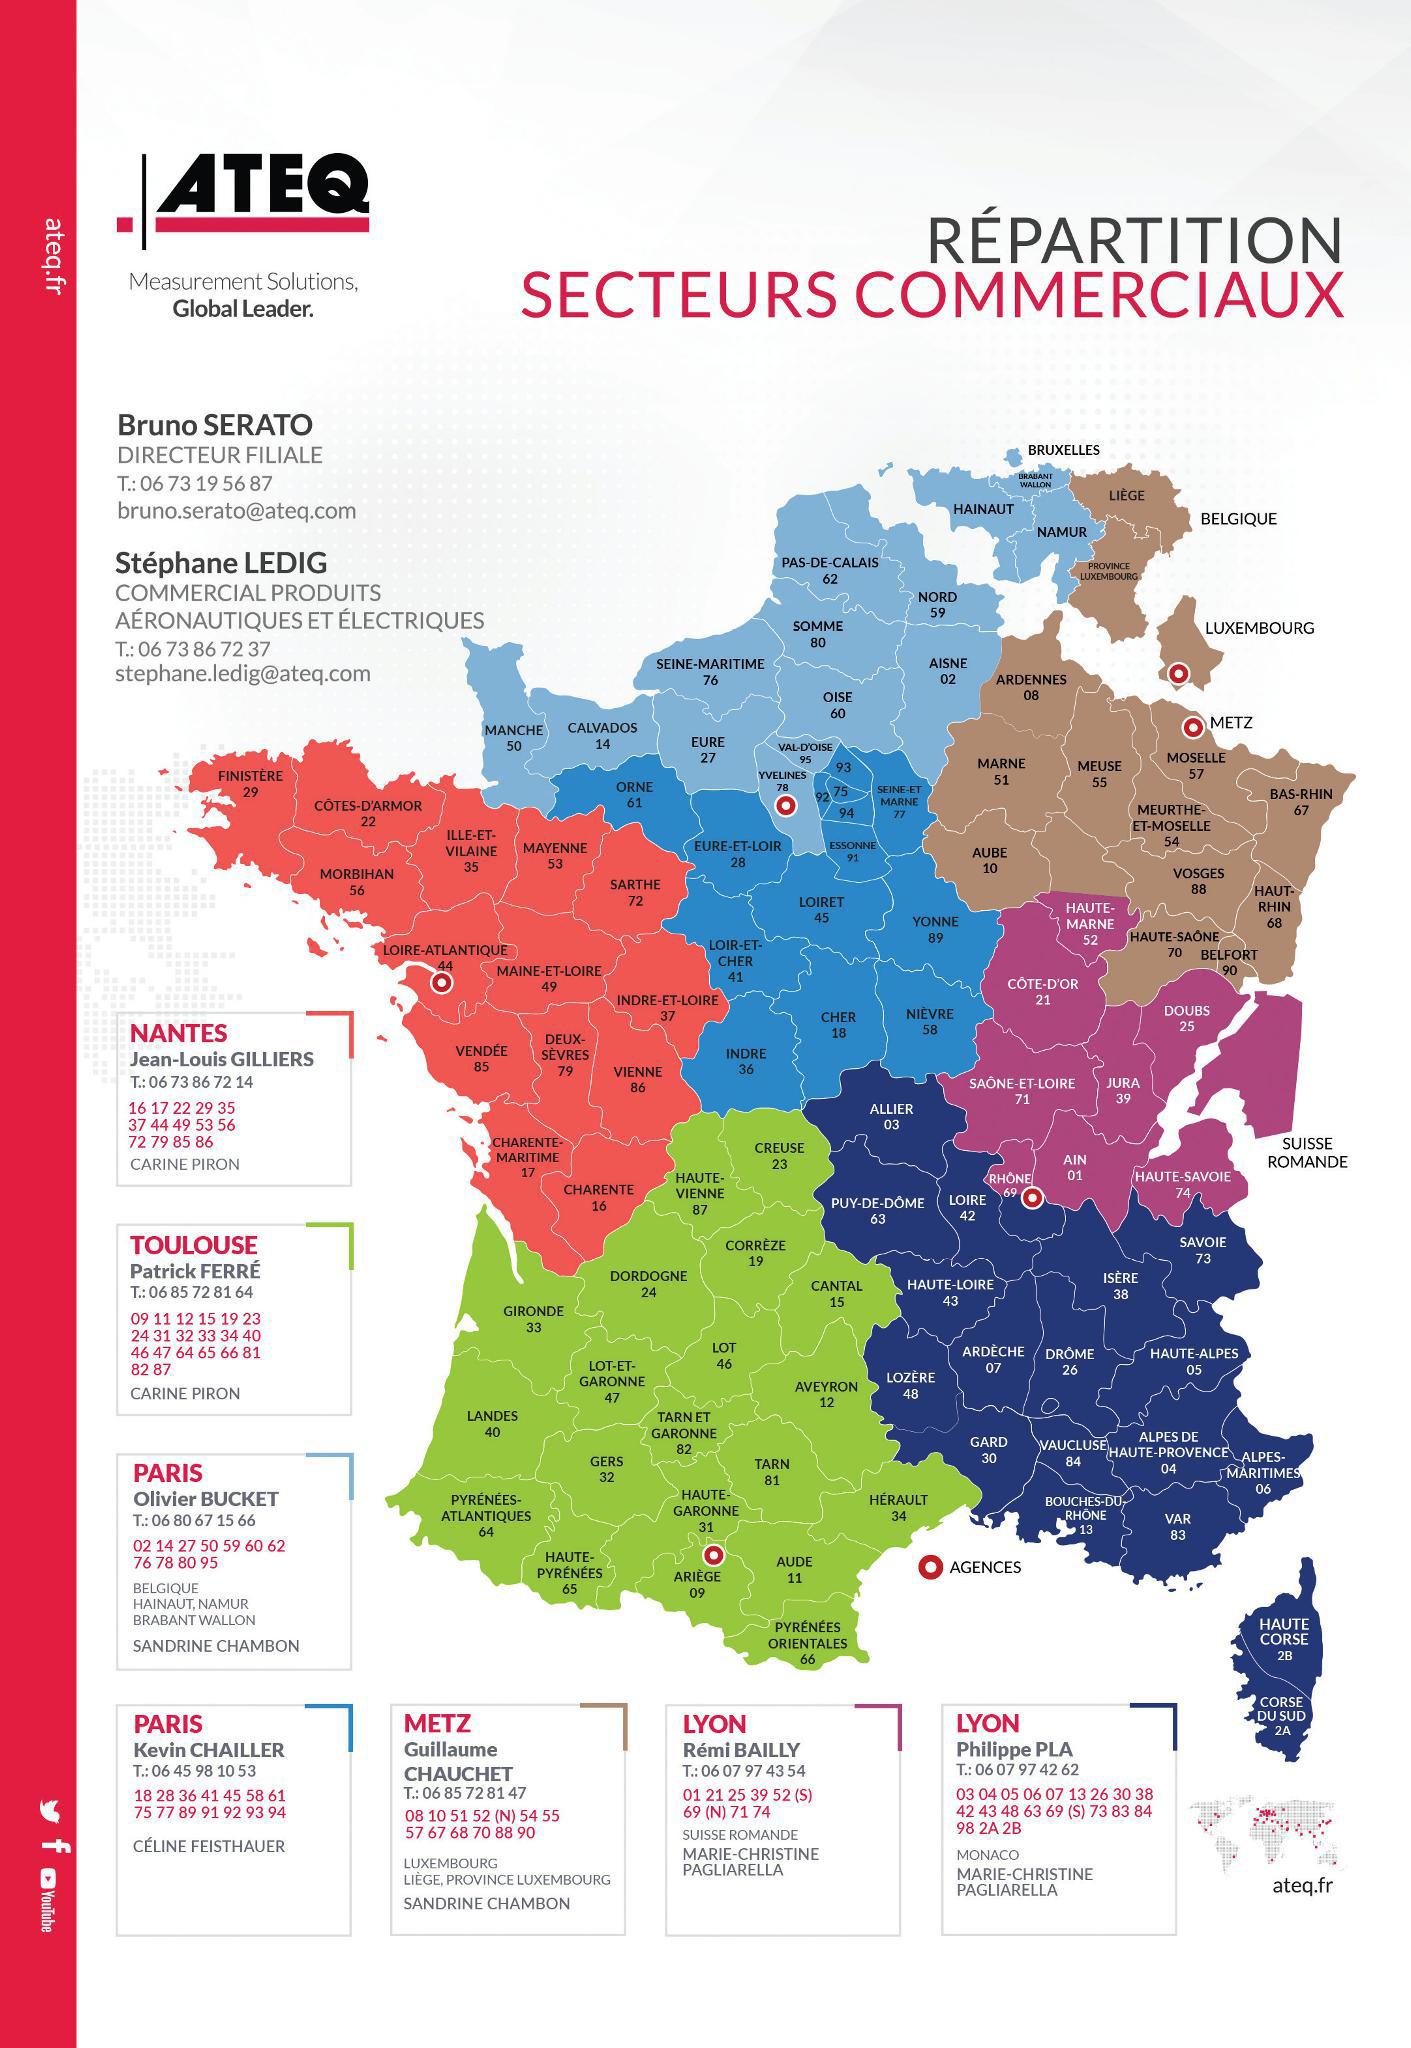 agences-ateq-france